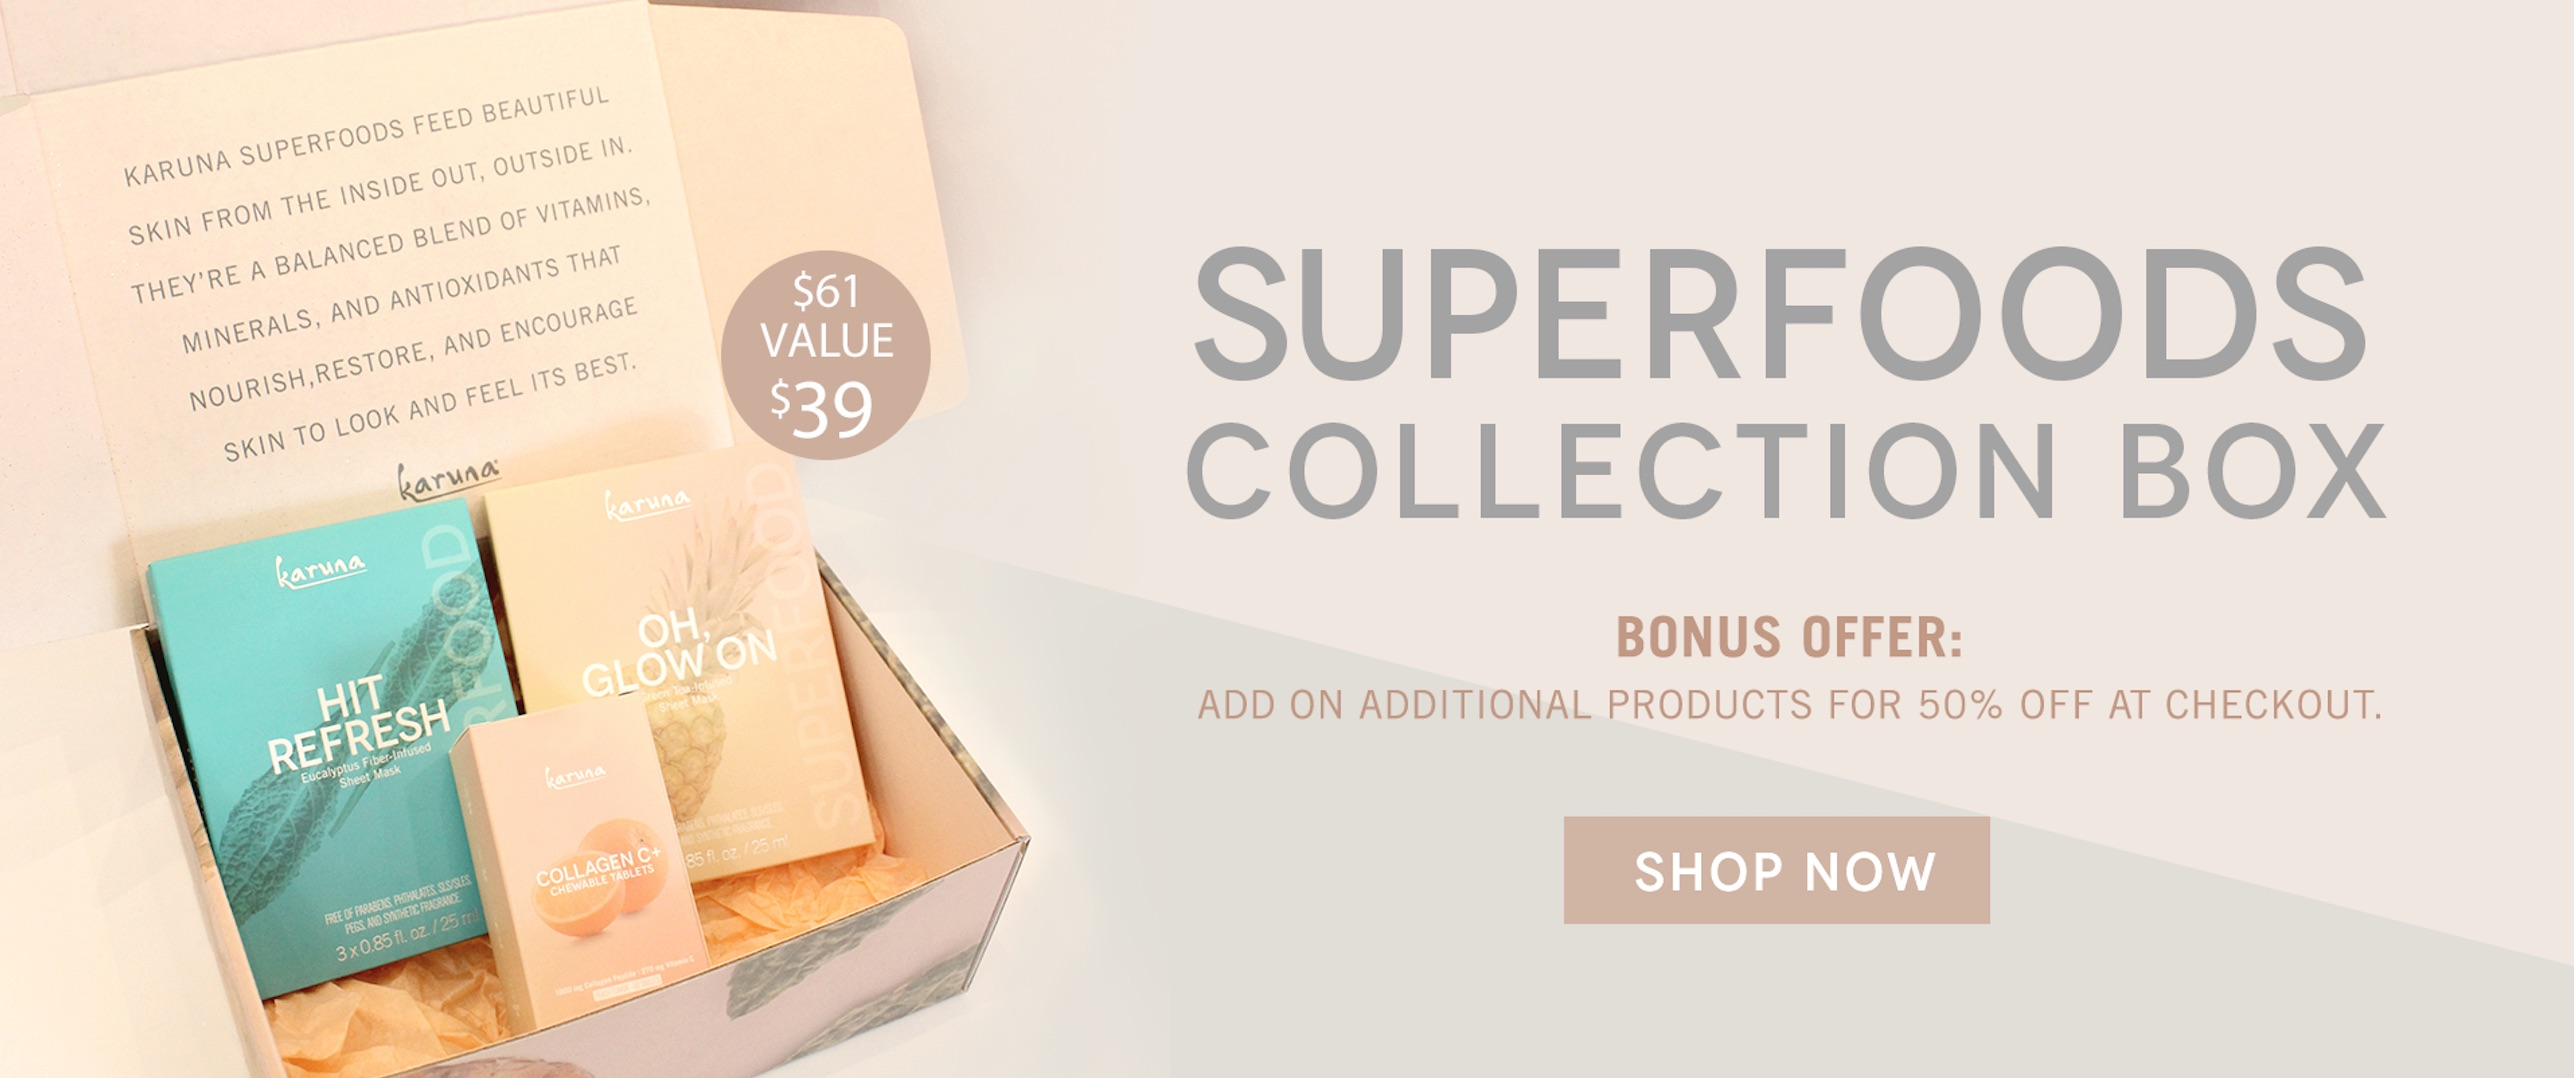 Superfoods Box